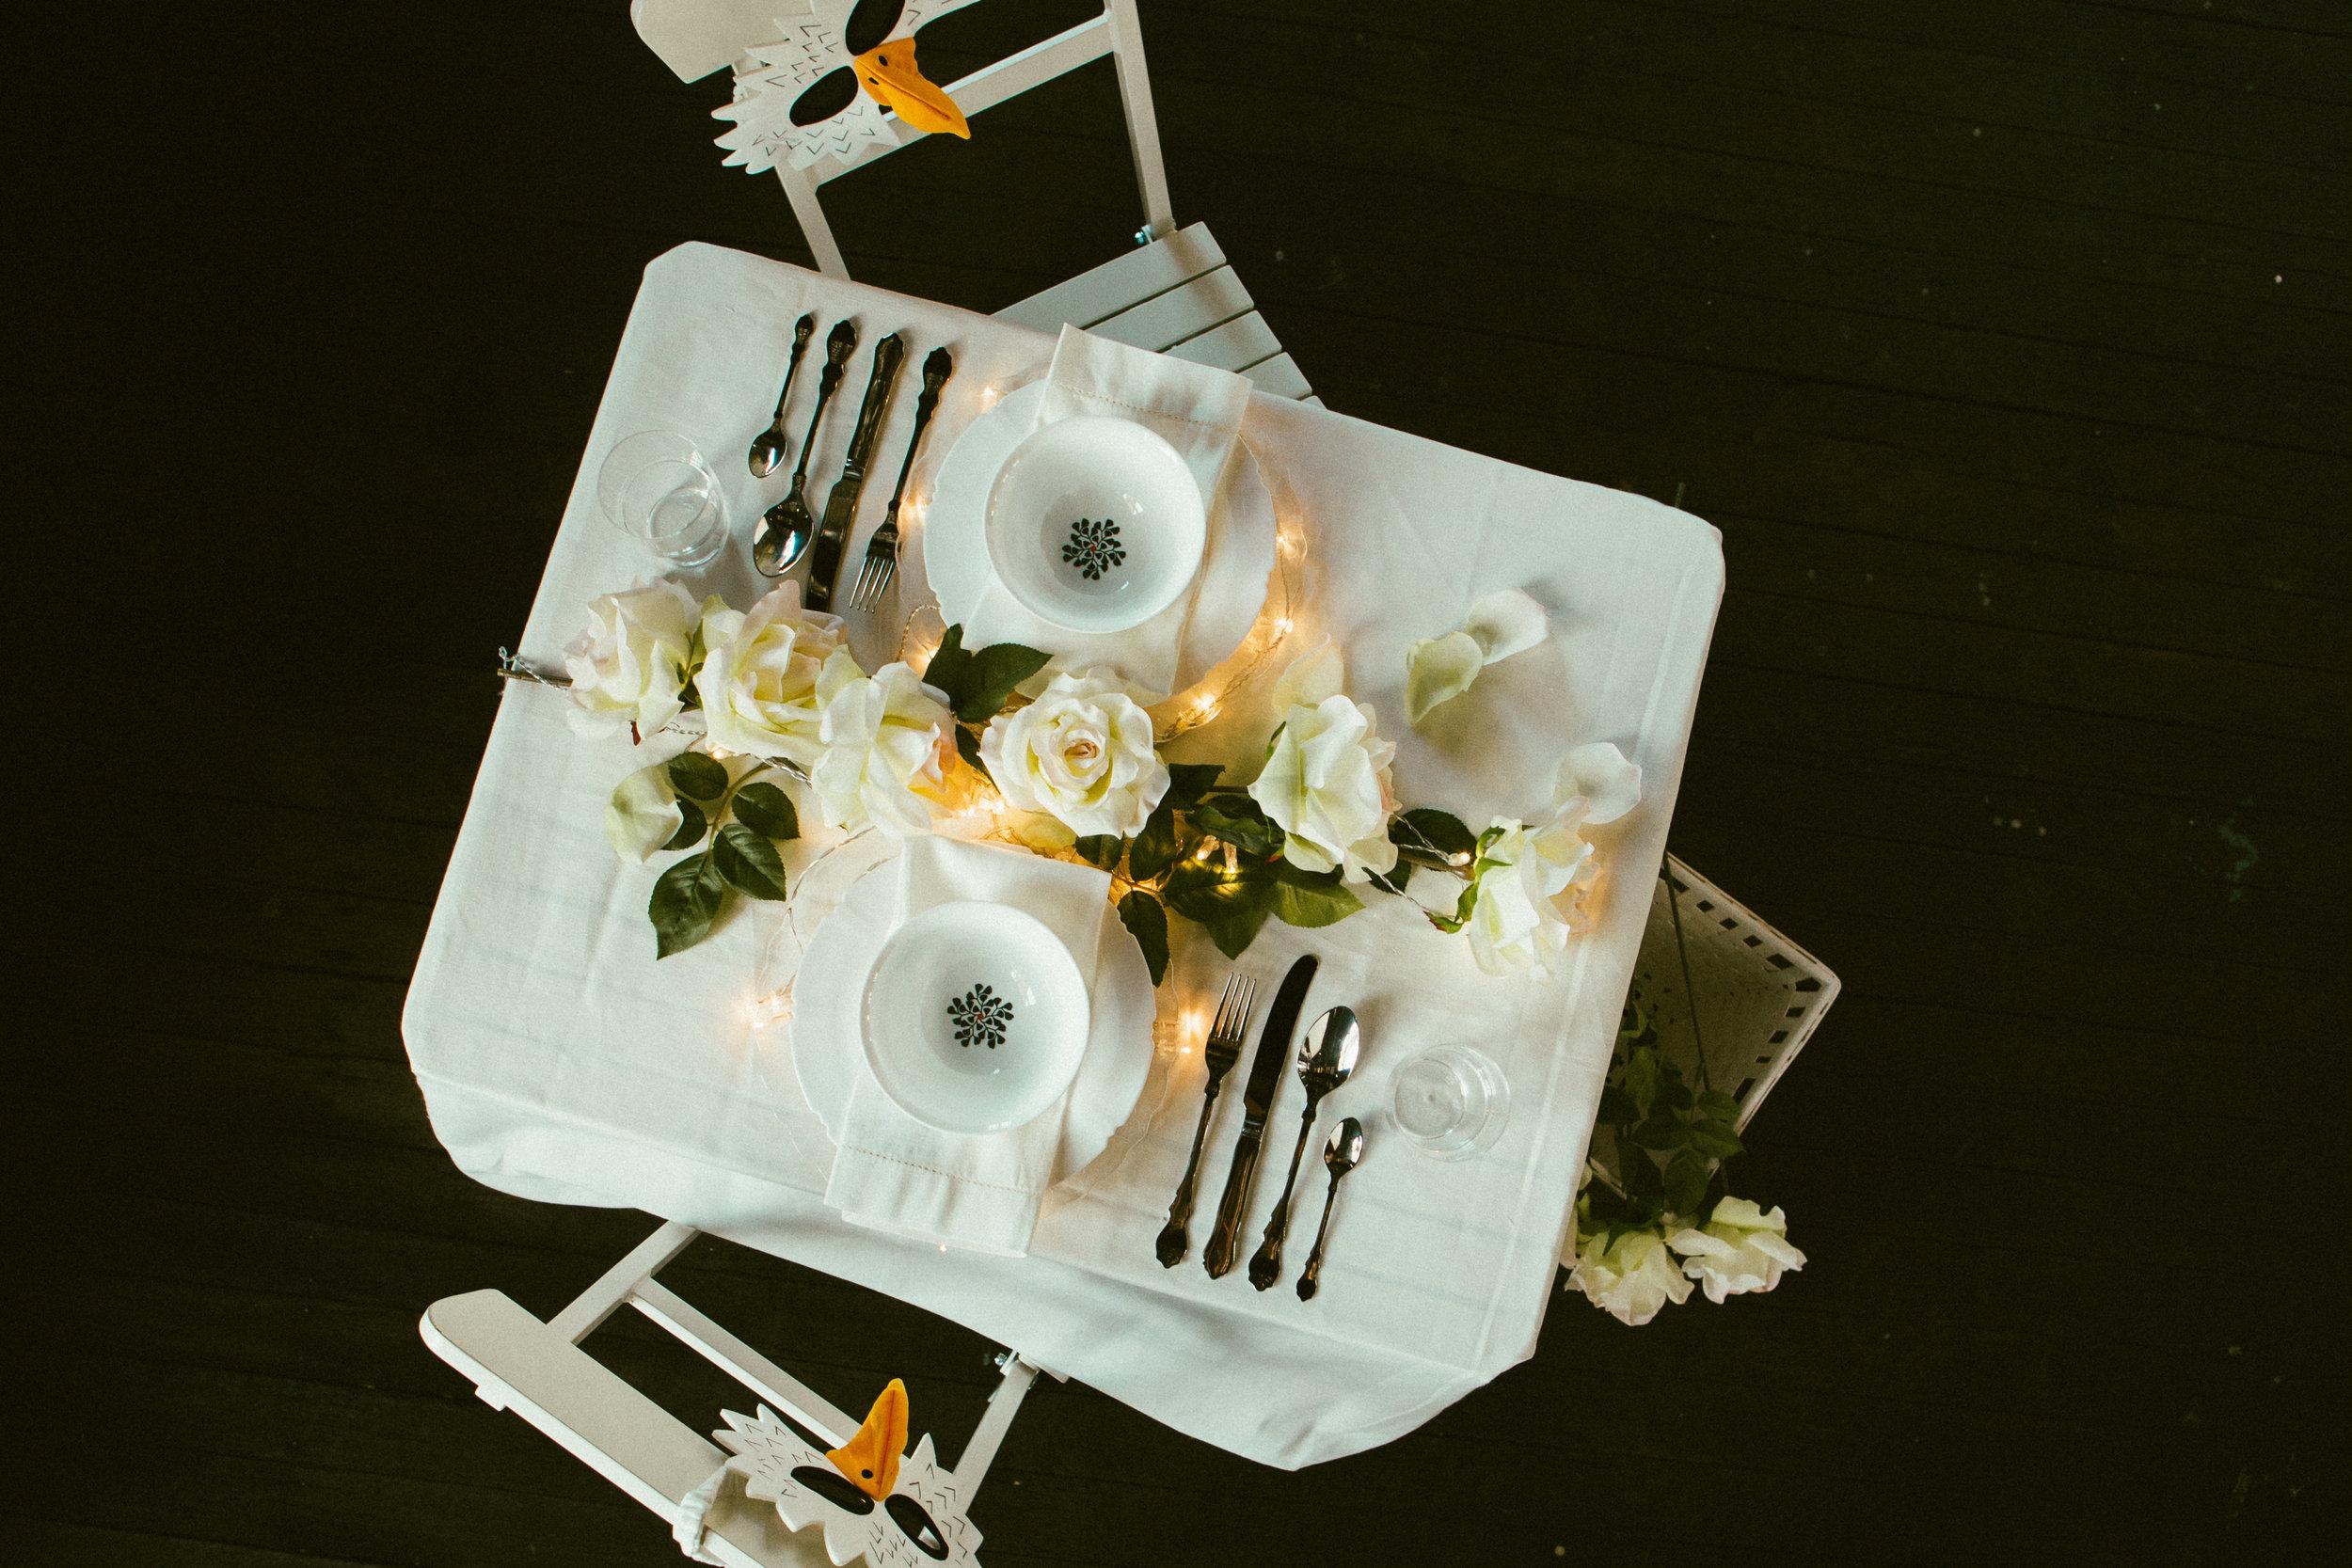 Table Setting 3_Roses&Mask_Edit1-23.jpg